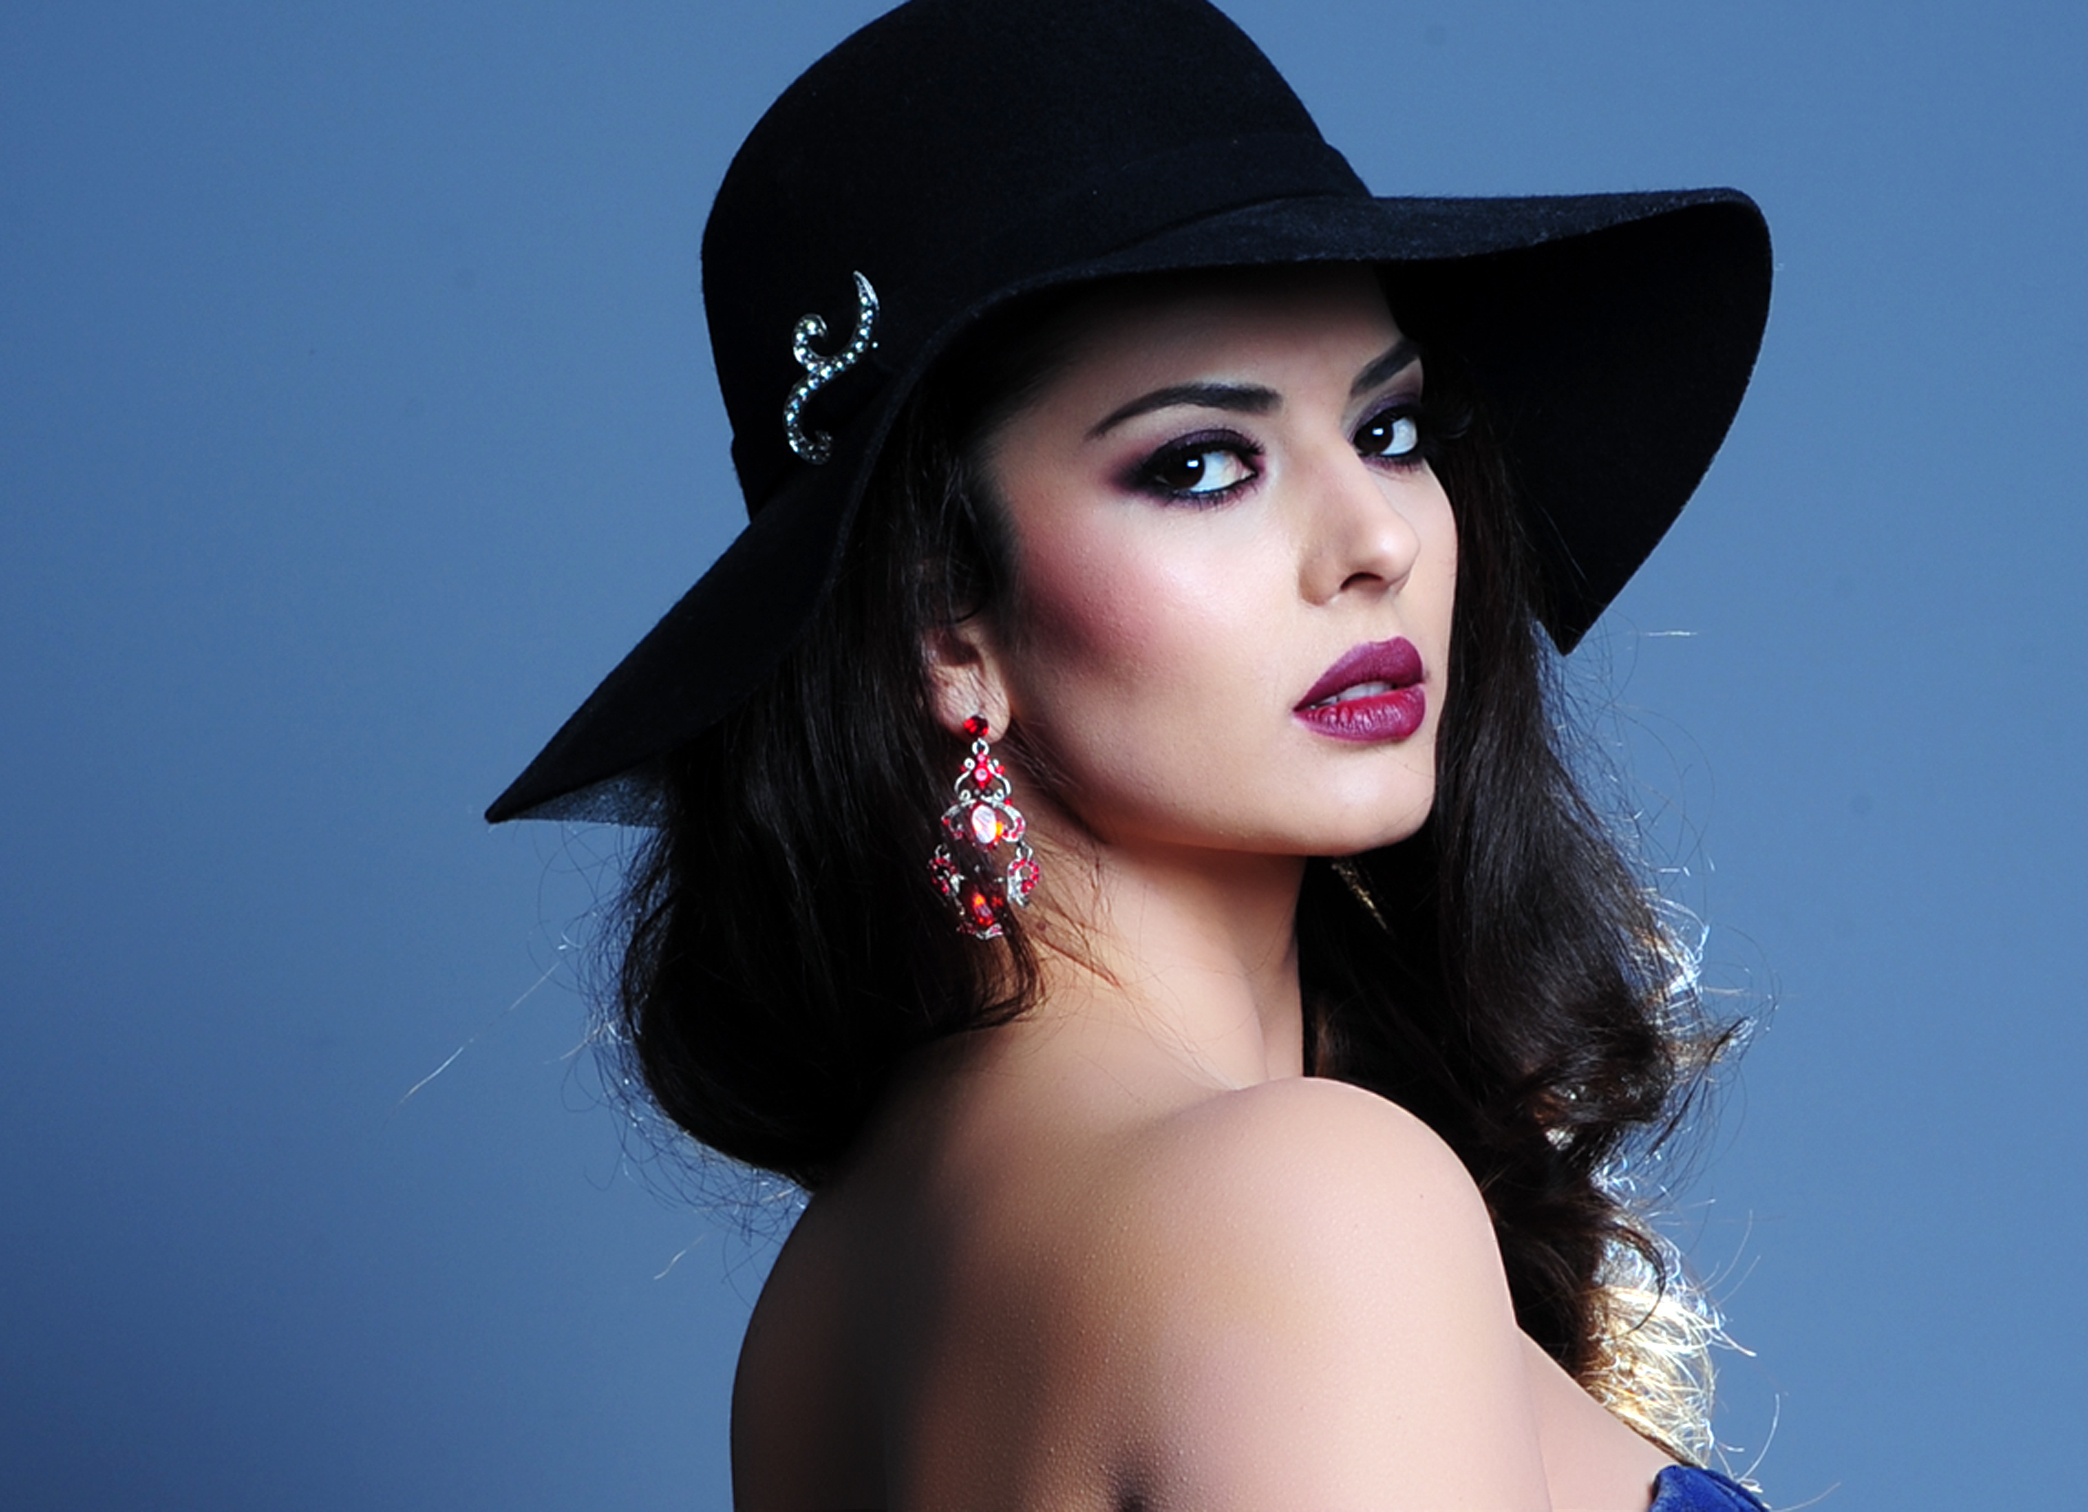 Some Beautiful Albanian Girls - AnthroScape